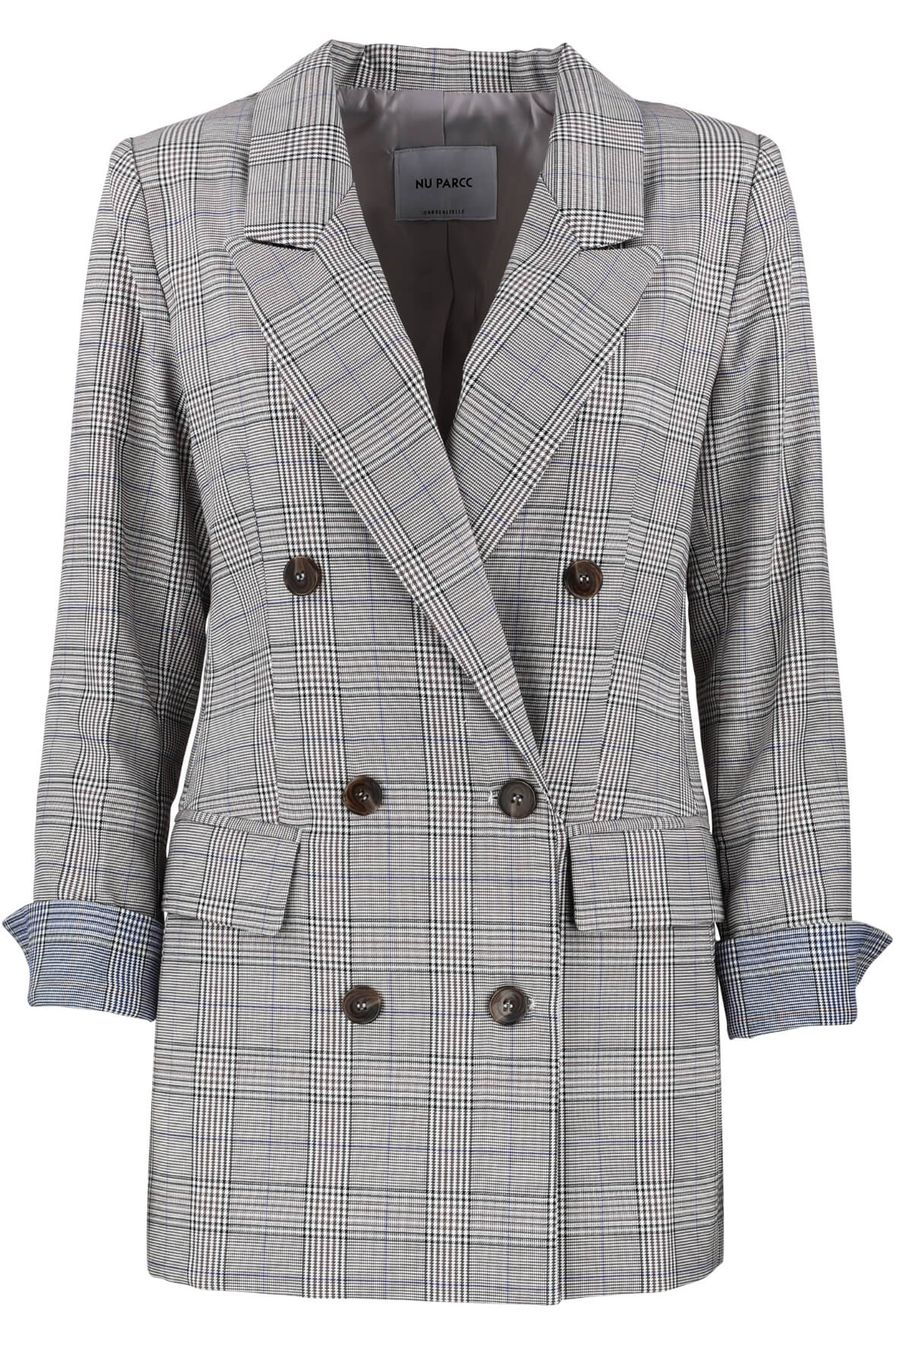 nu-parcc-spring-plaid-jacket-1